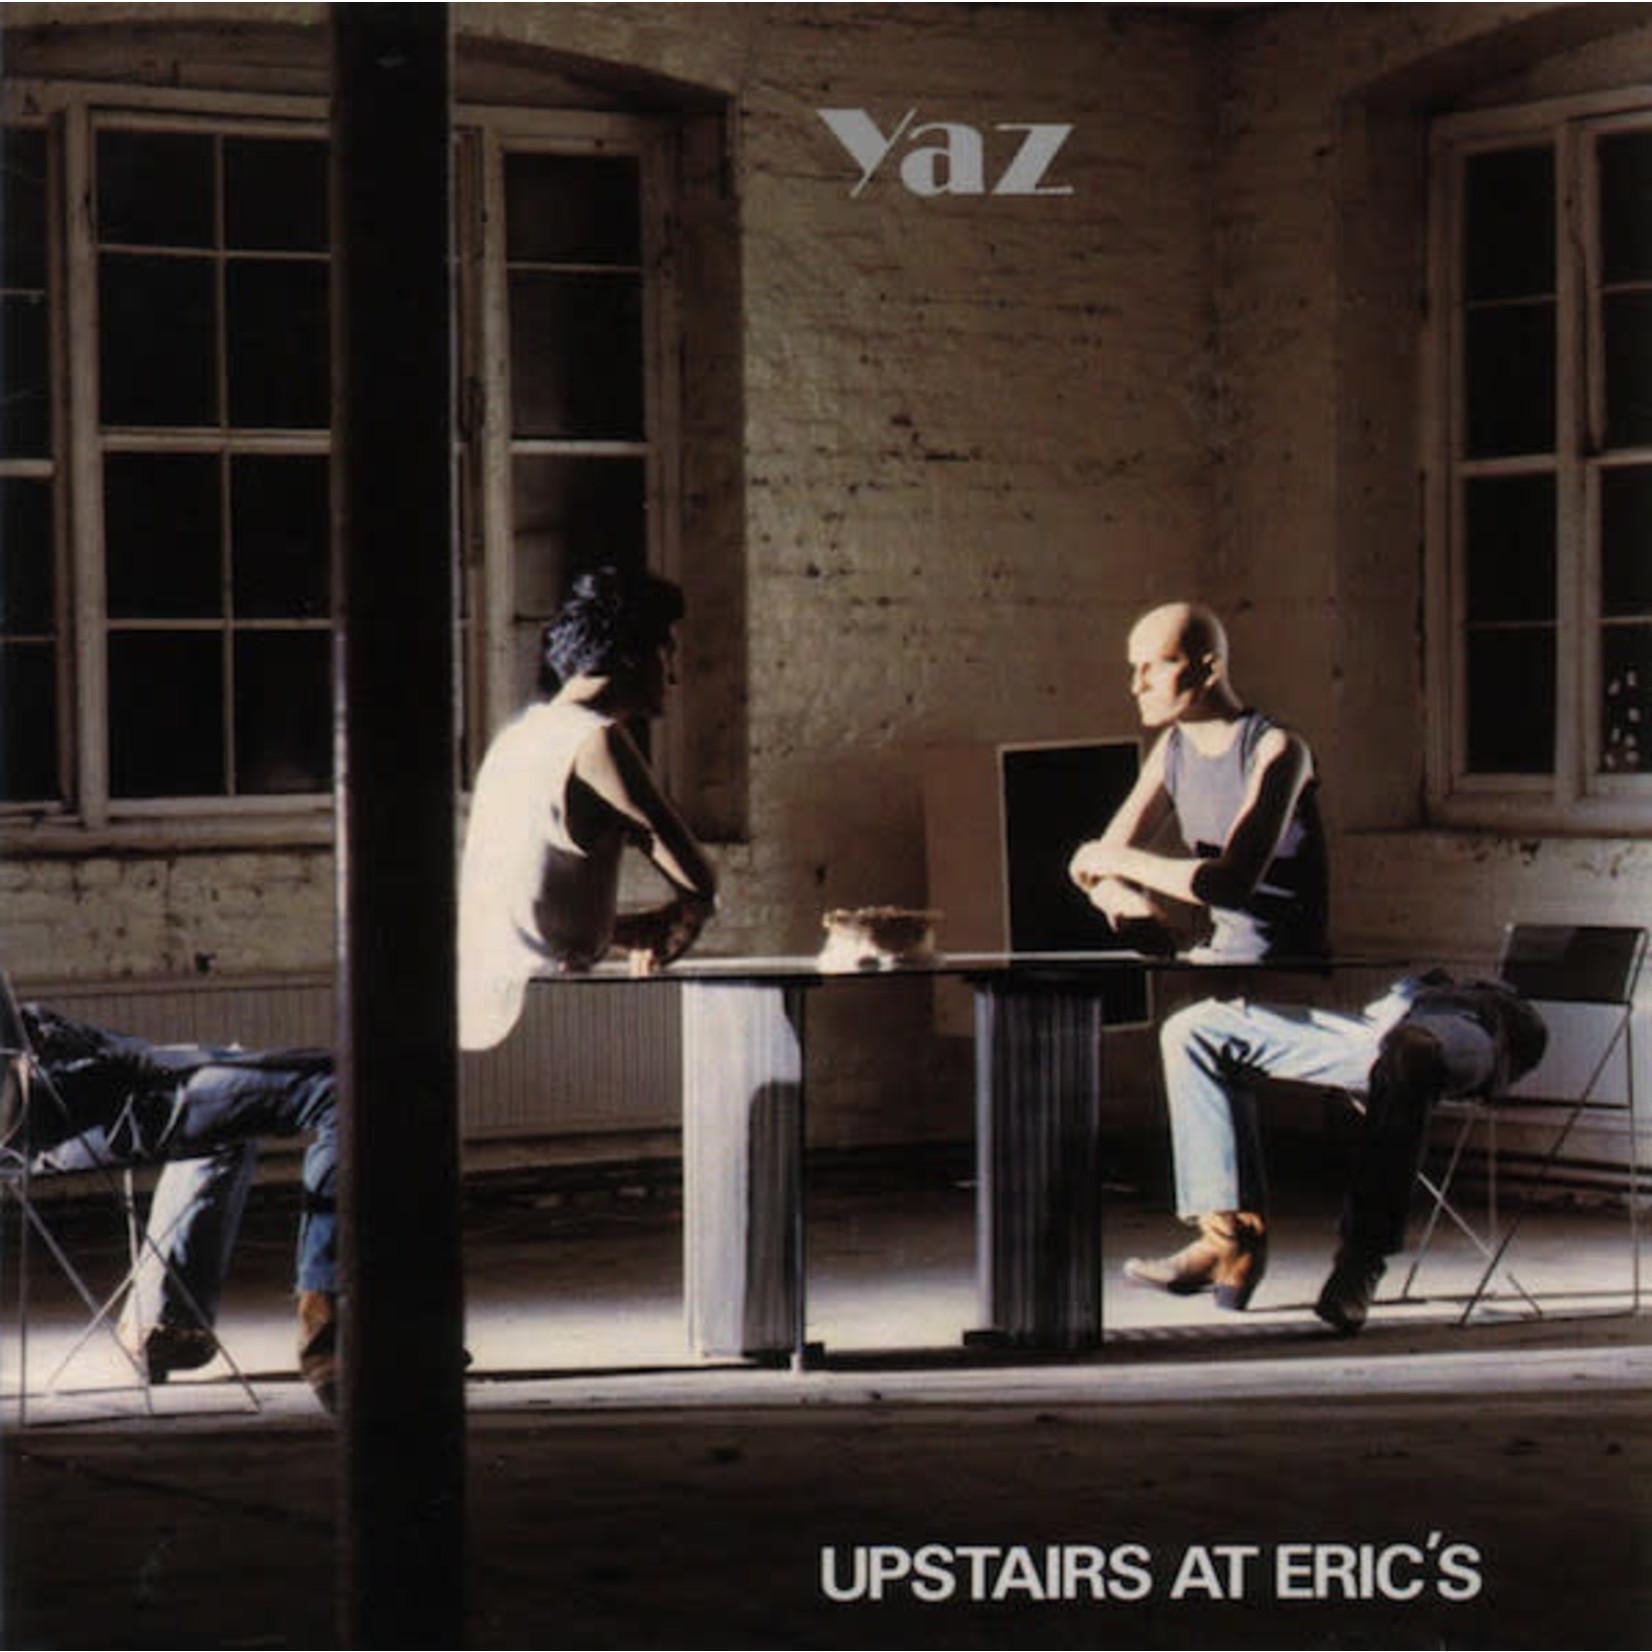 [Vintage] Yaz: Upstairs at Eric's